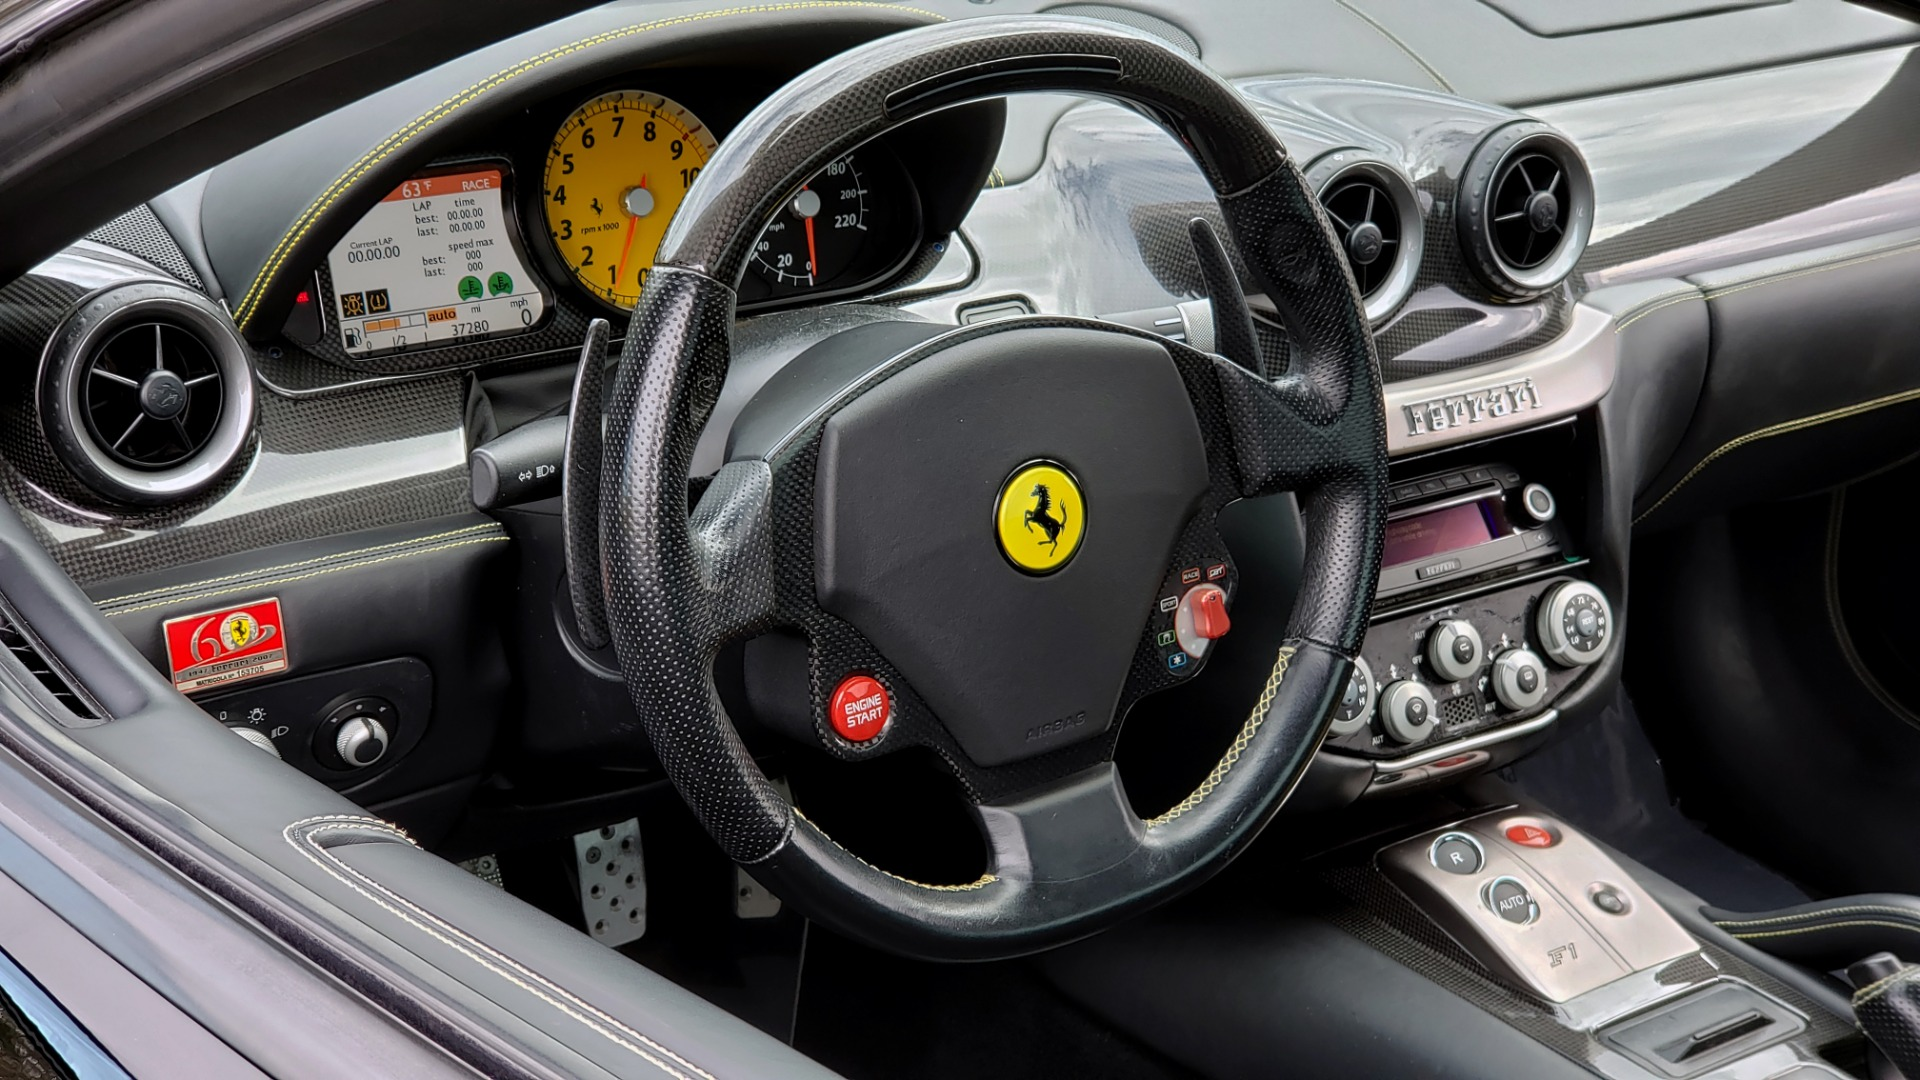 Used 2007 Ferrari 599 GTB FIORANO HGTE / V12 / F1 TRANS / NAV / BOSE / CUSTOM WHEELS for sale $109,999 at Formula Imports in Charlotte NC 28227 47